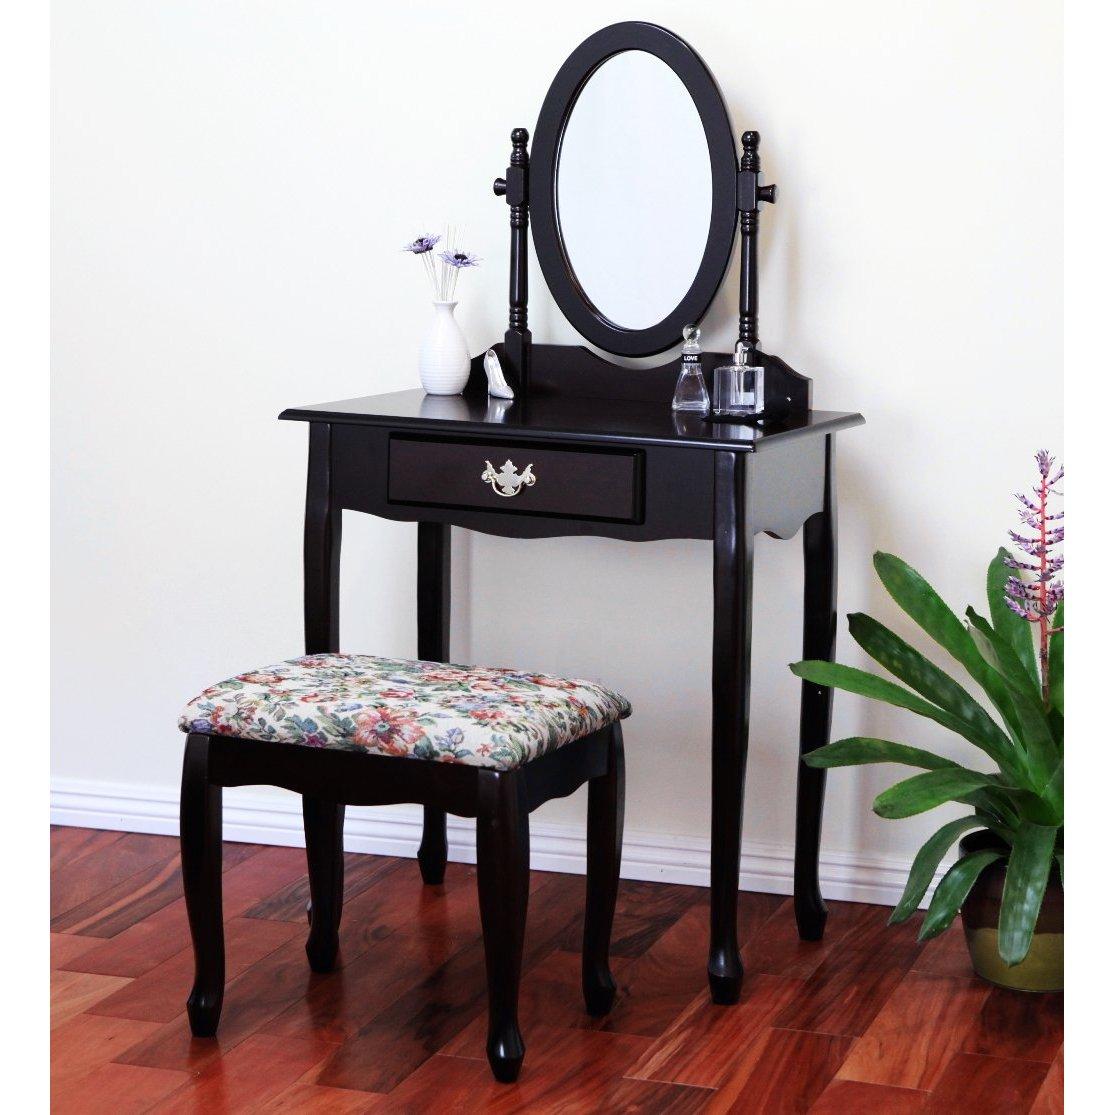 Vanity Tables with Oval Mirror: Cherry Finish Vanity Set